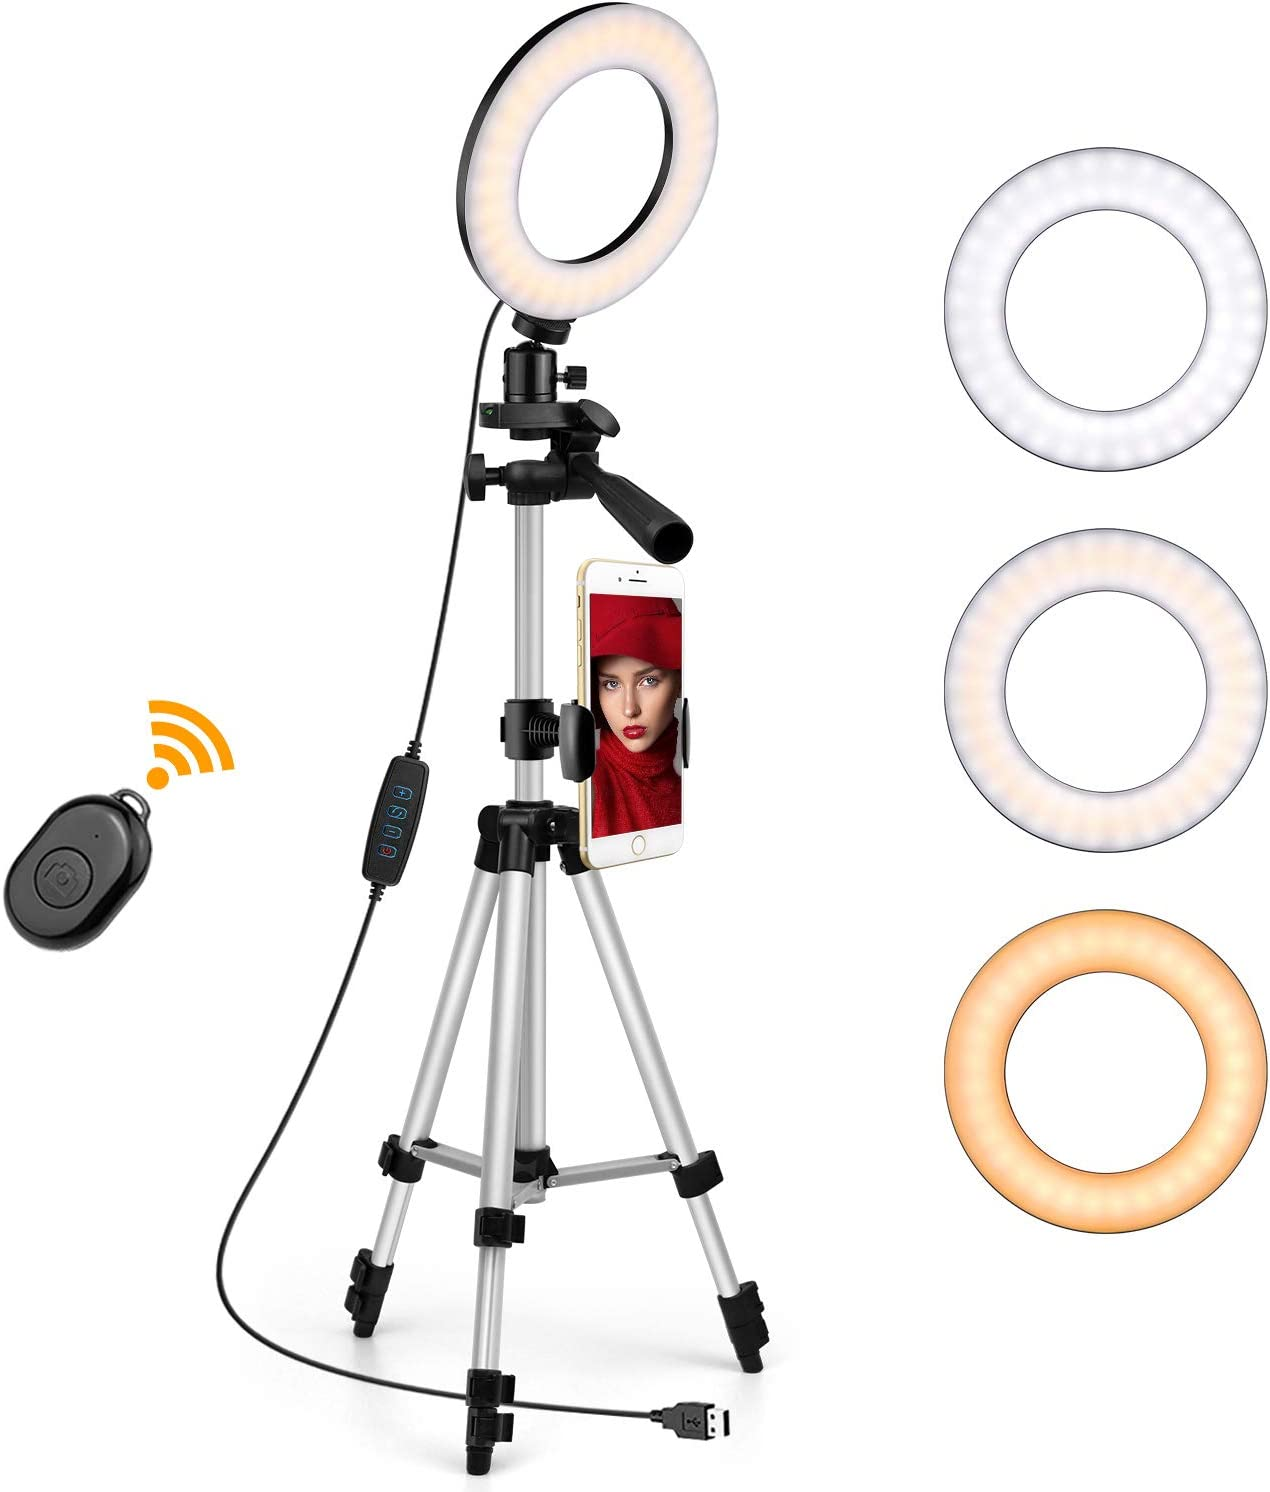 "6"" Ring Light with Tripod Stand Cell Phone Holder for Live Stream/Makeup/YouTube, OldShark Mini Led Selfie Makeup Ring Light, 3 Colors & 10 Brightness Level"